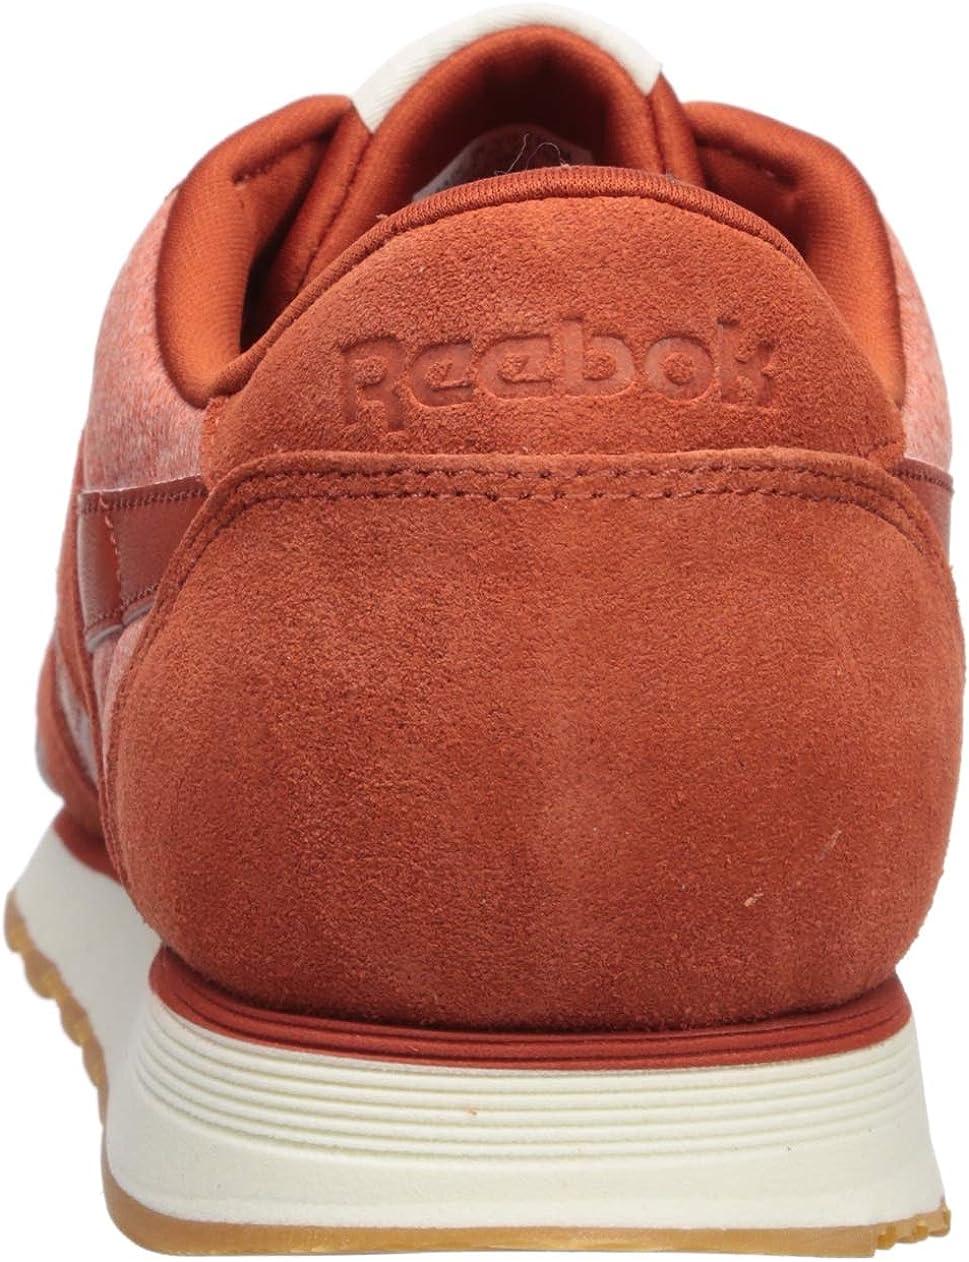 Reebok Herren Classic Leather Nylon M Turnschuh Burnt Amber Kreide